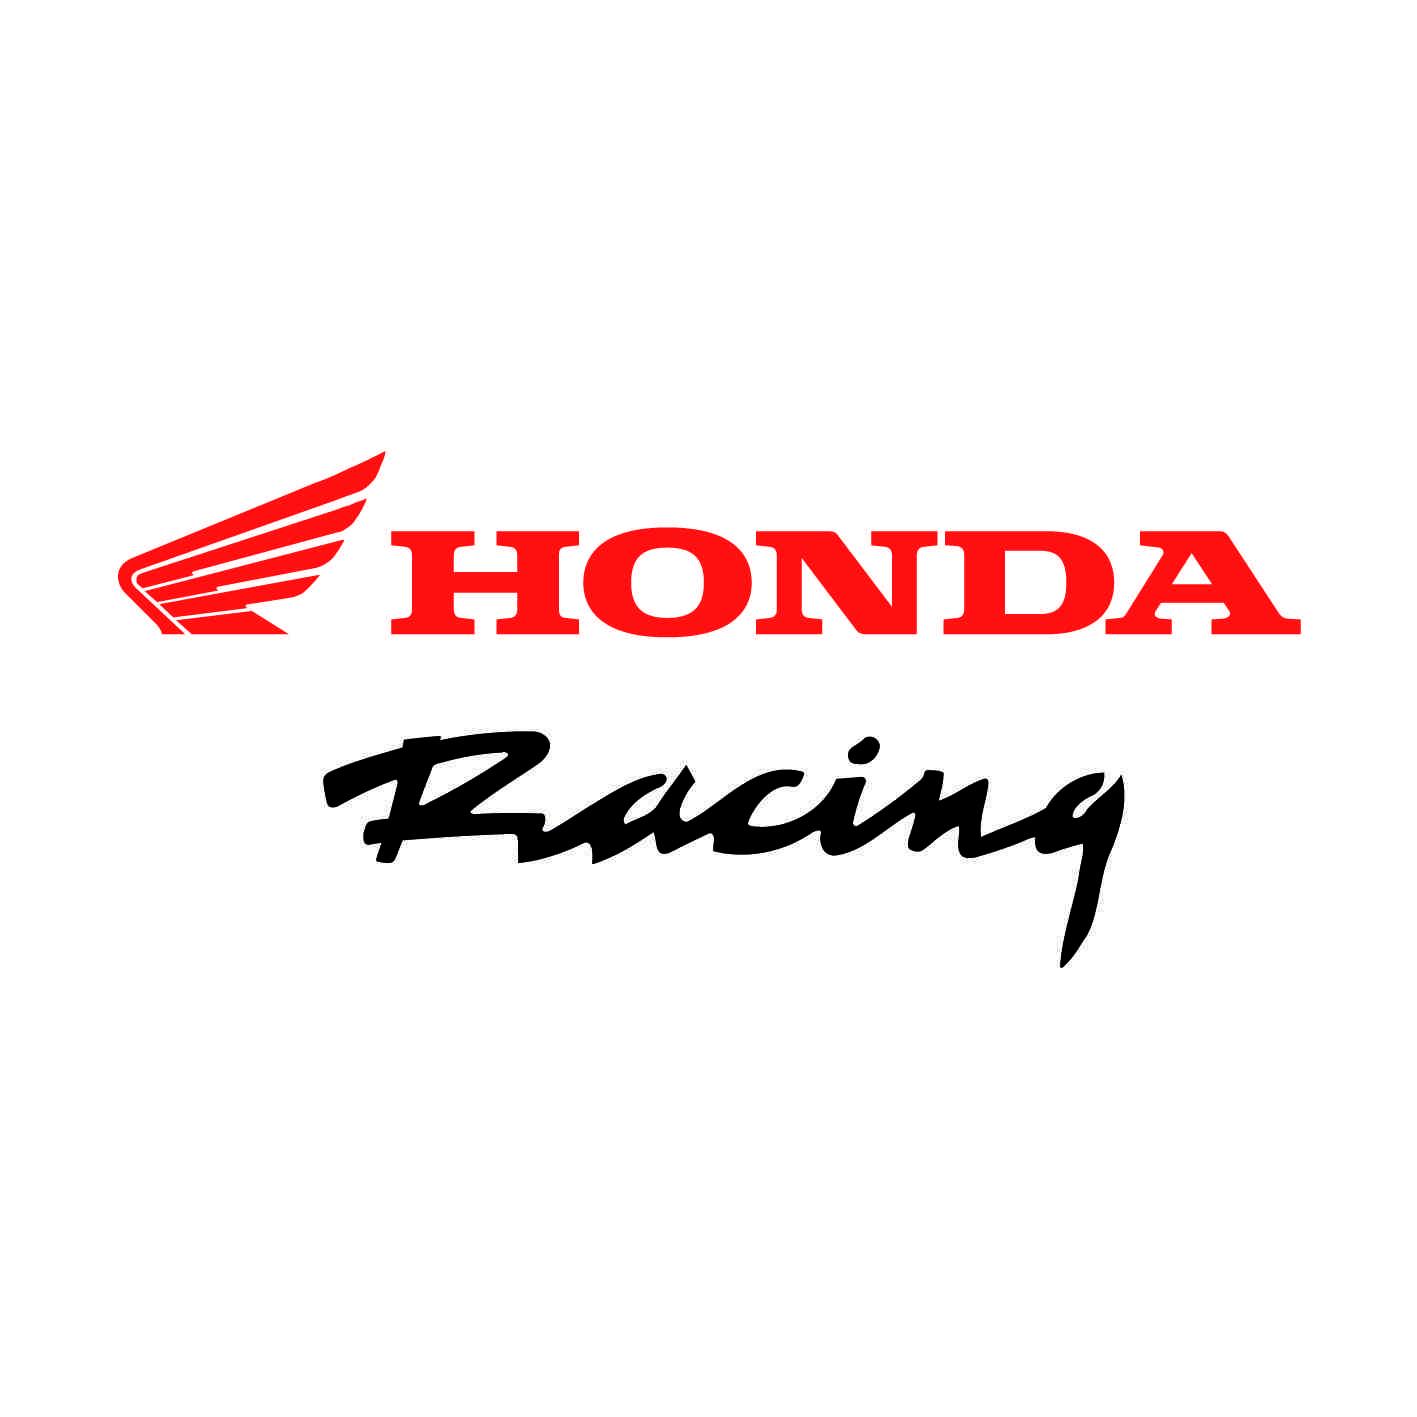 honda-ref14-stickers-moto-casque-scooter-sticker-autocollant-adhesifs